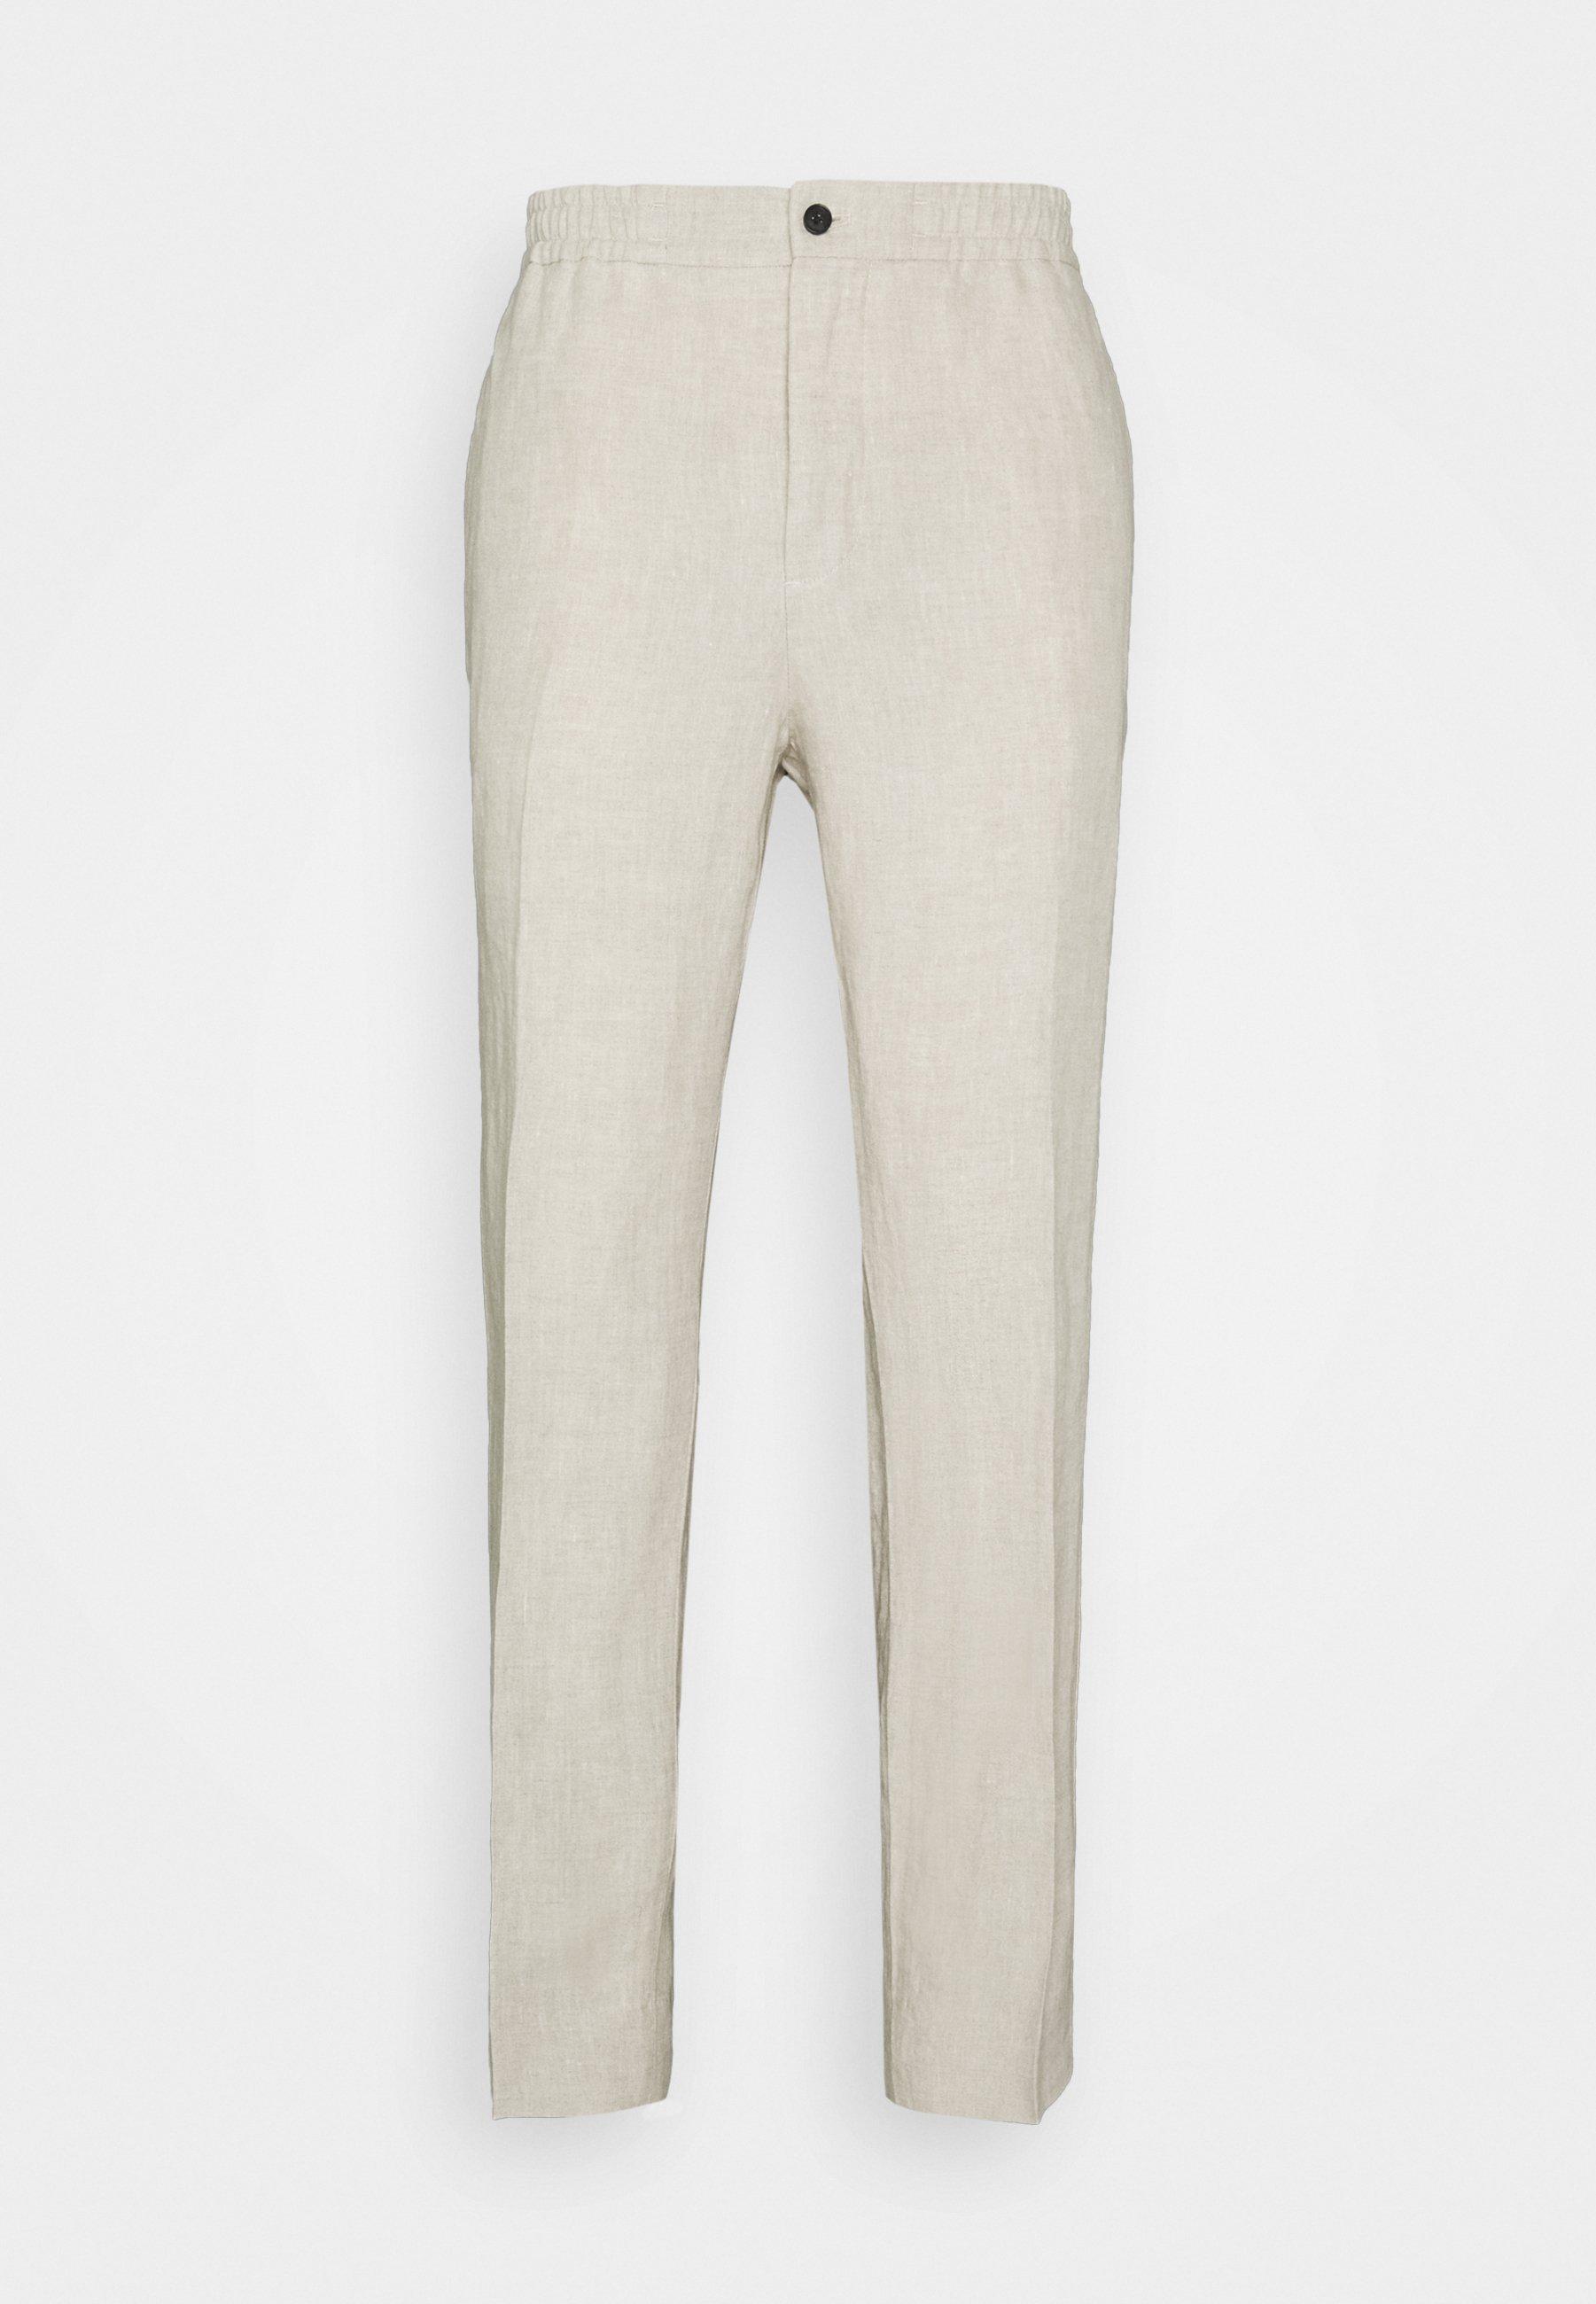 Homme SASHA DRAPE PANTS - Pantalon classique